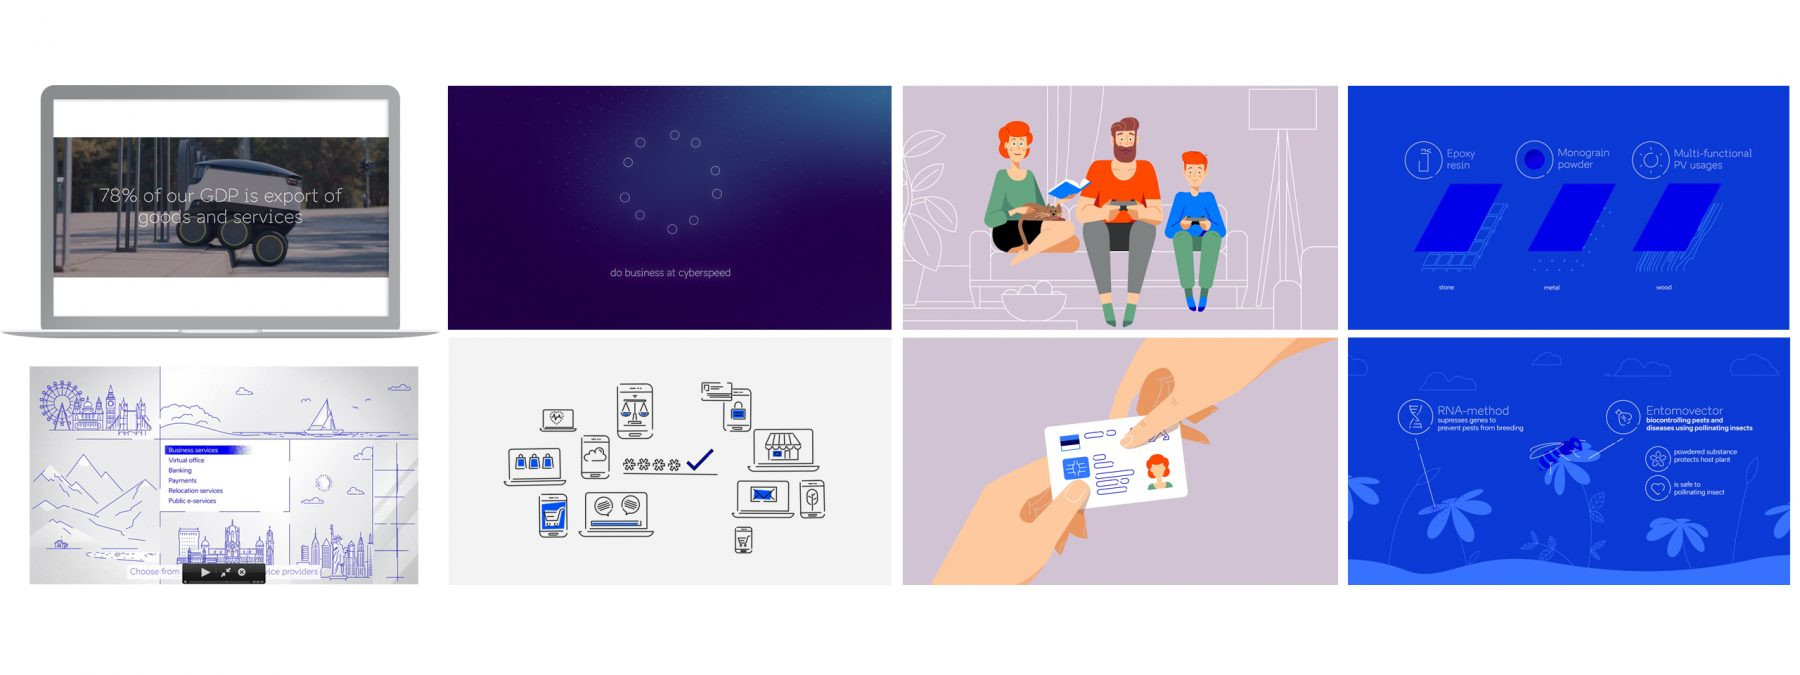 brand estonia video guidelines